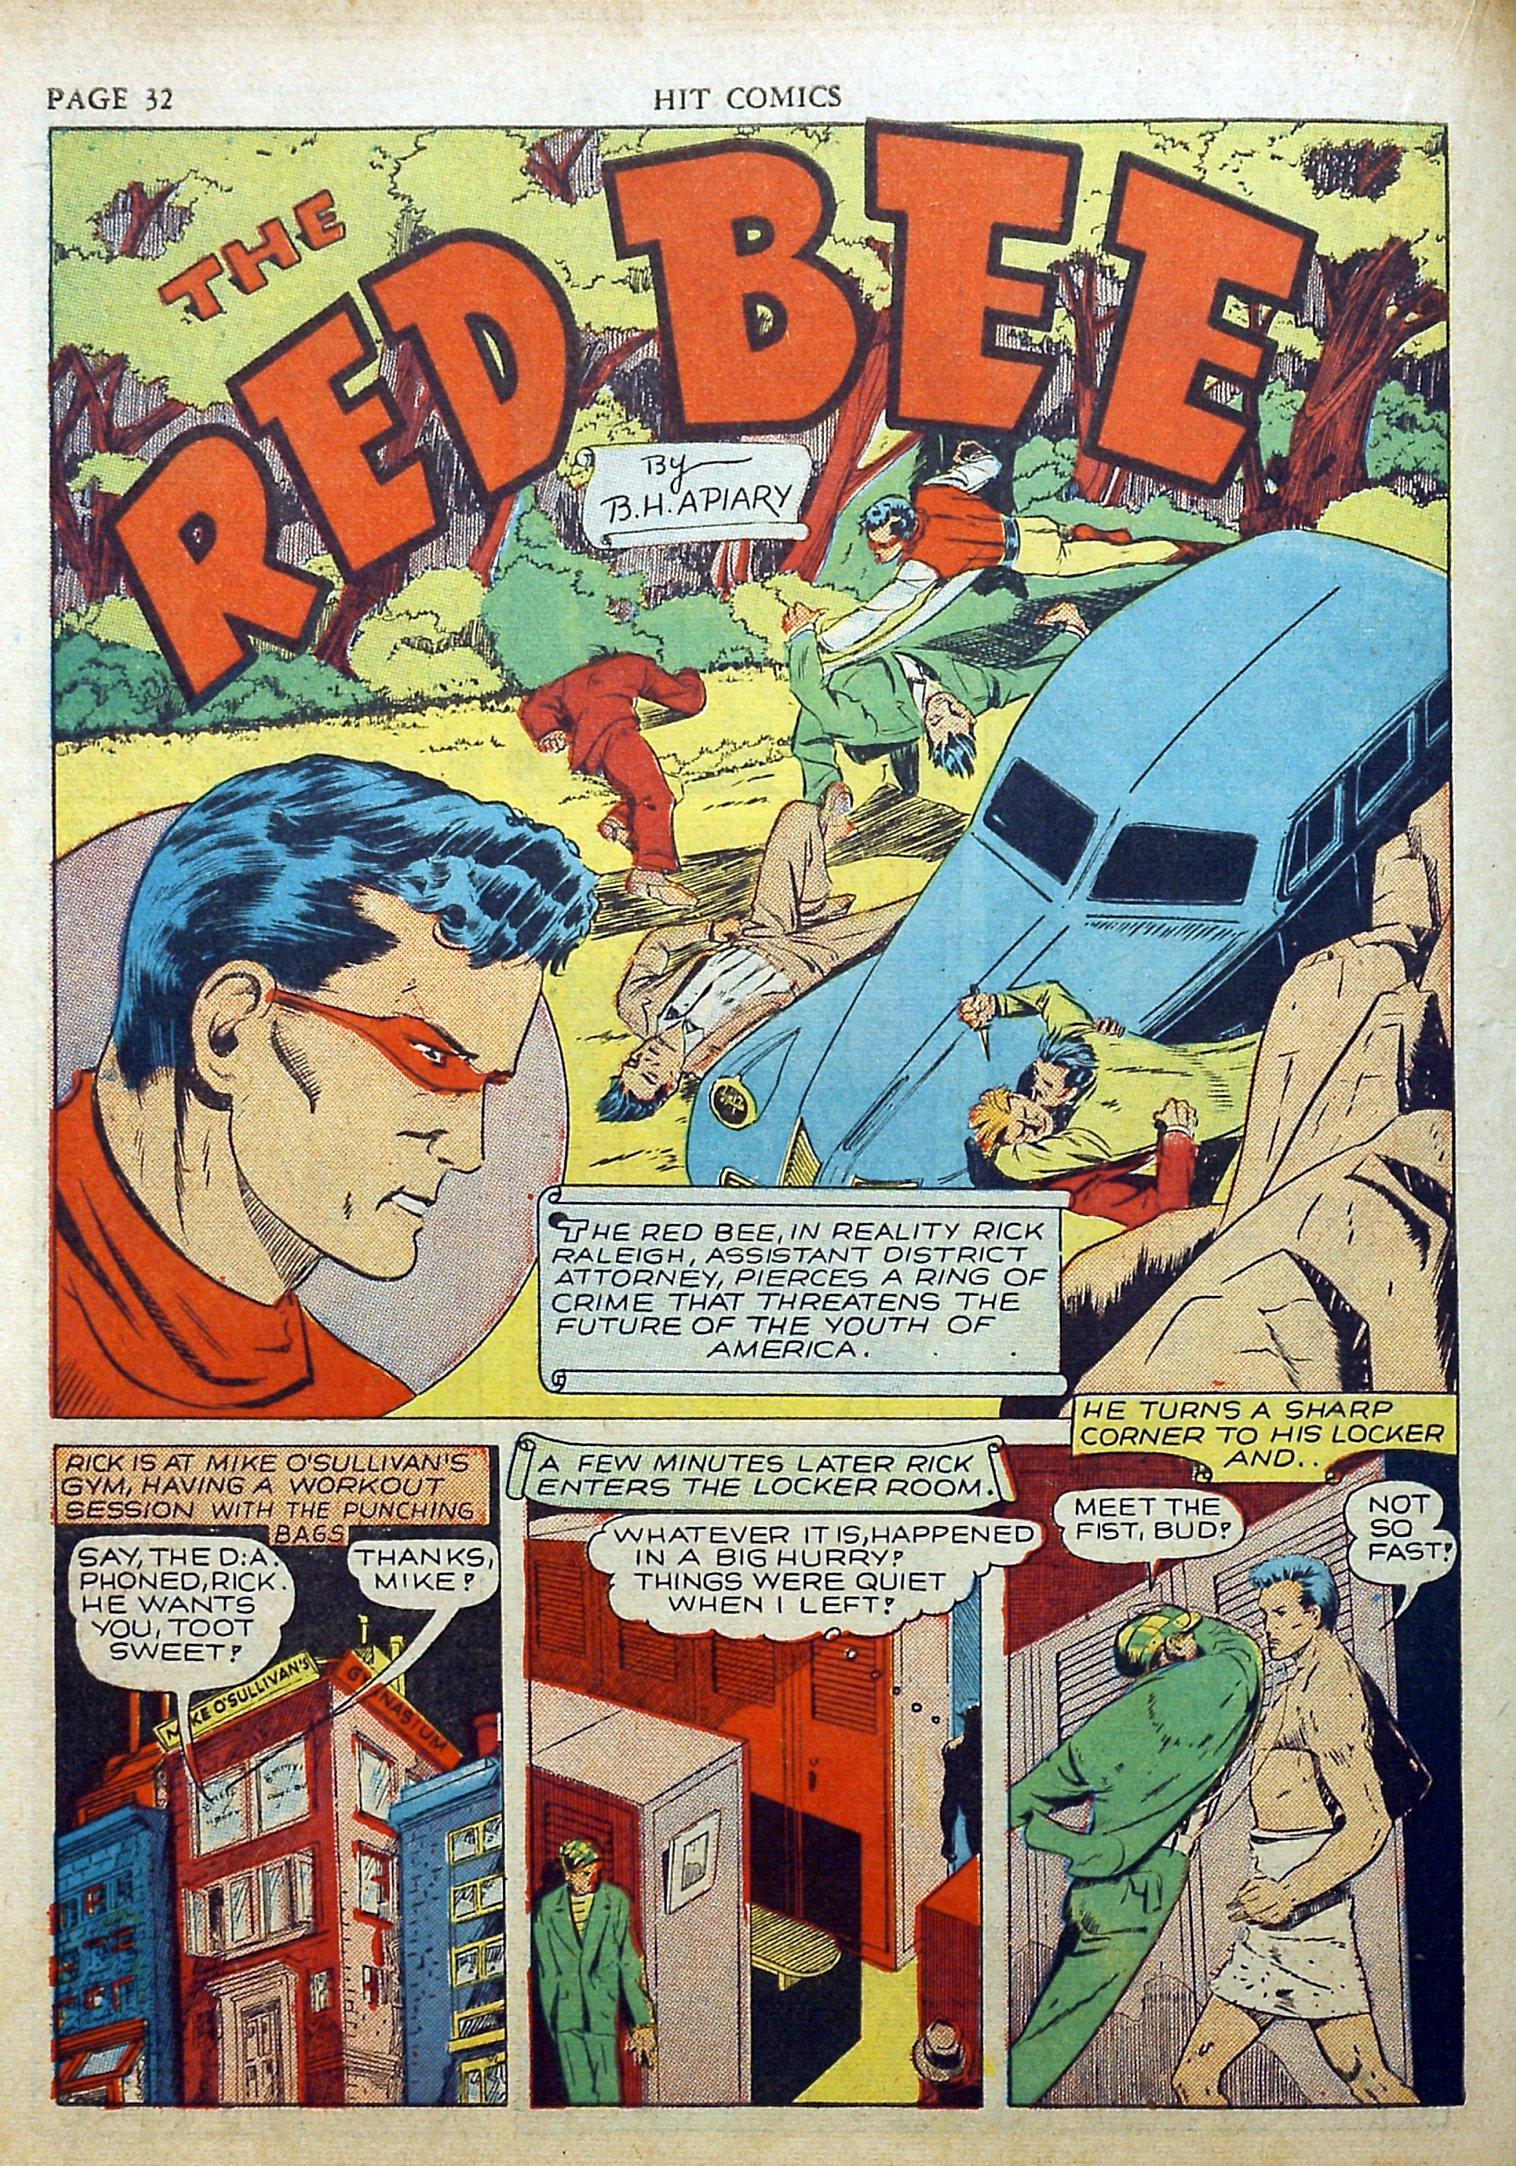 Read online Hit Comics comic -  Issue #17 - 34